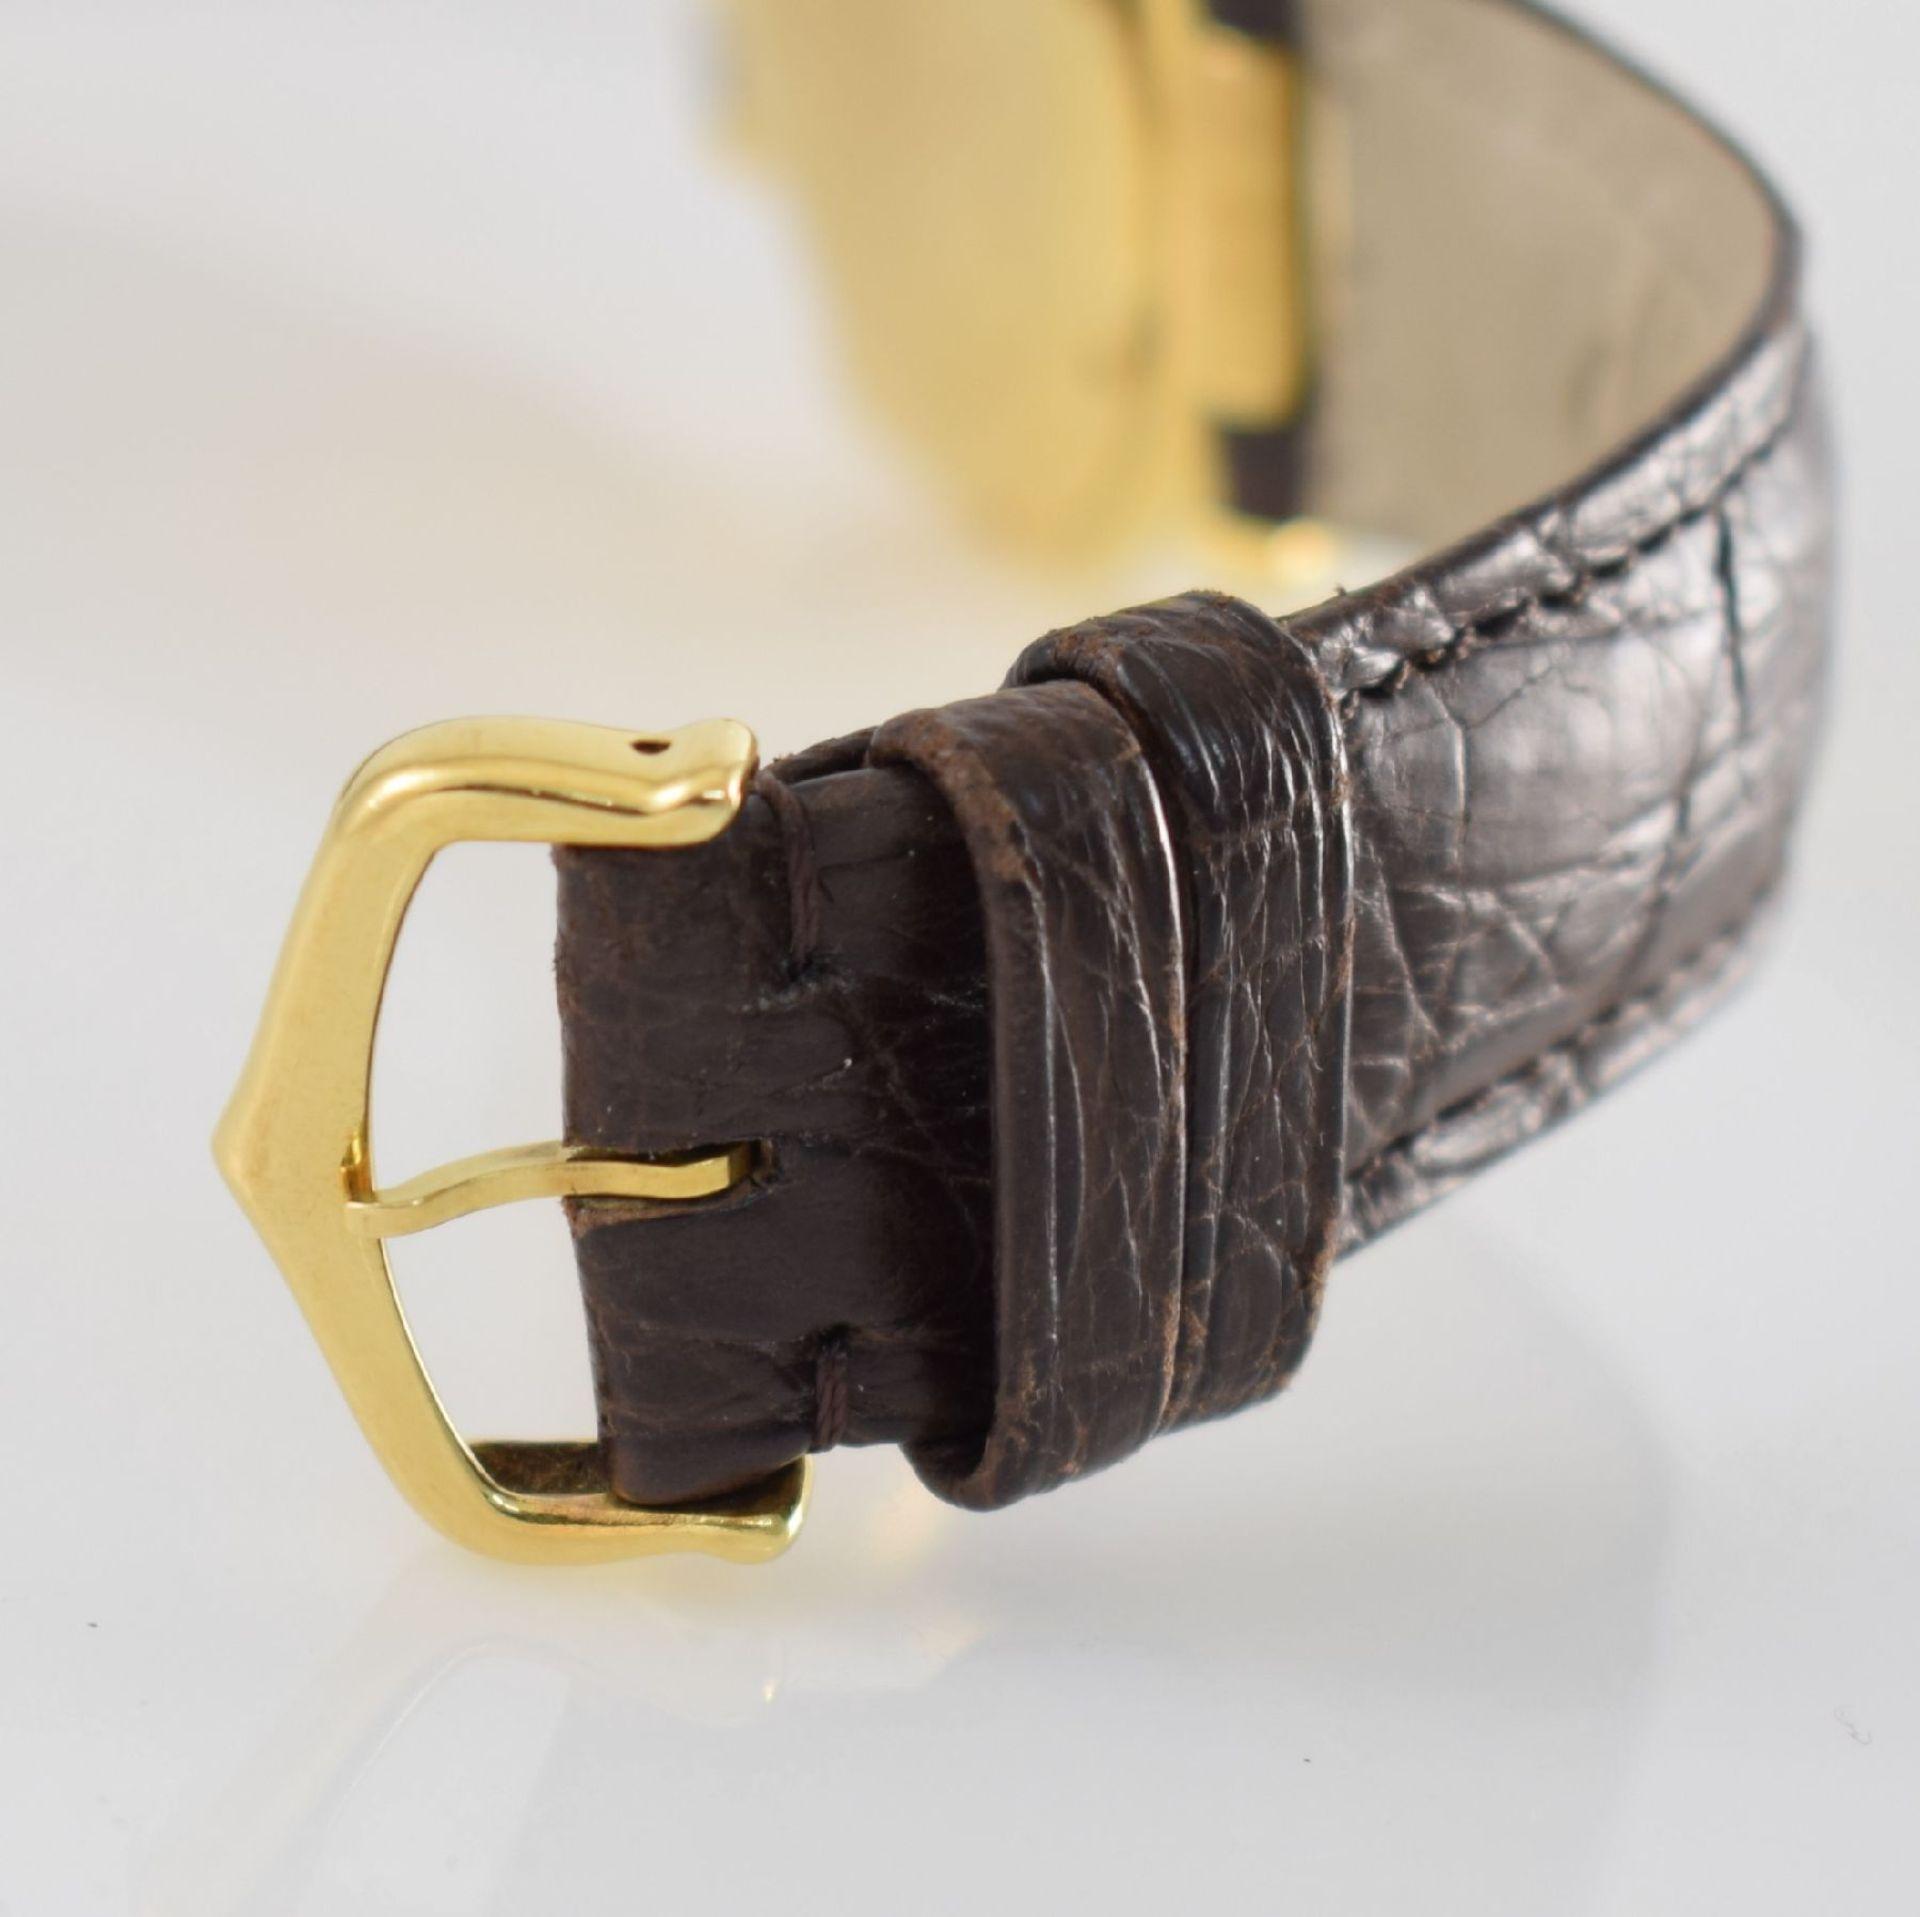 CARTIER Armbanduhr Serie Pasha in GG 750/000, Automatik, Schweiz um 1990, Ref. 1991, Lederband m. - Bild 6 aus 7